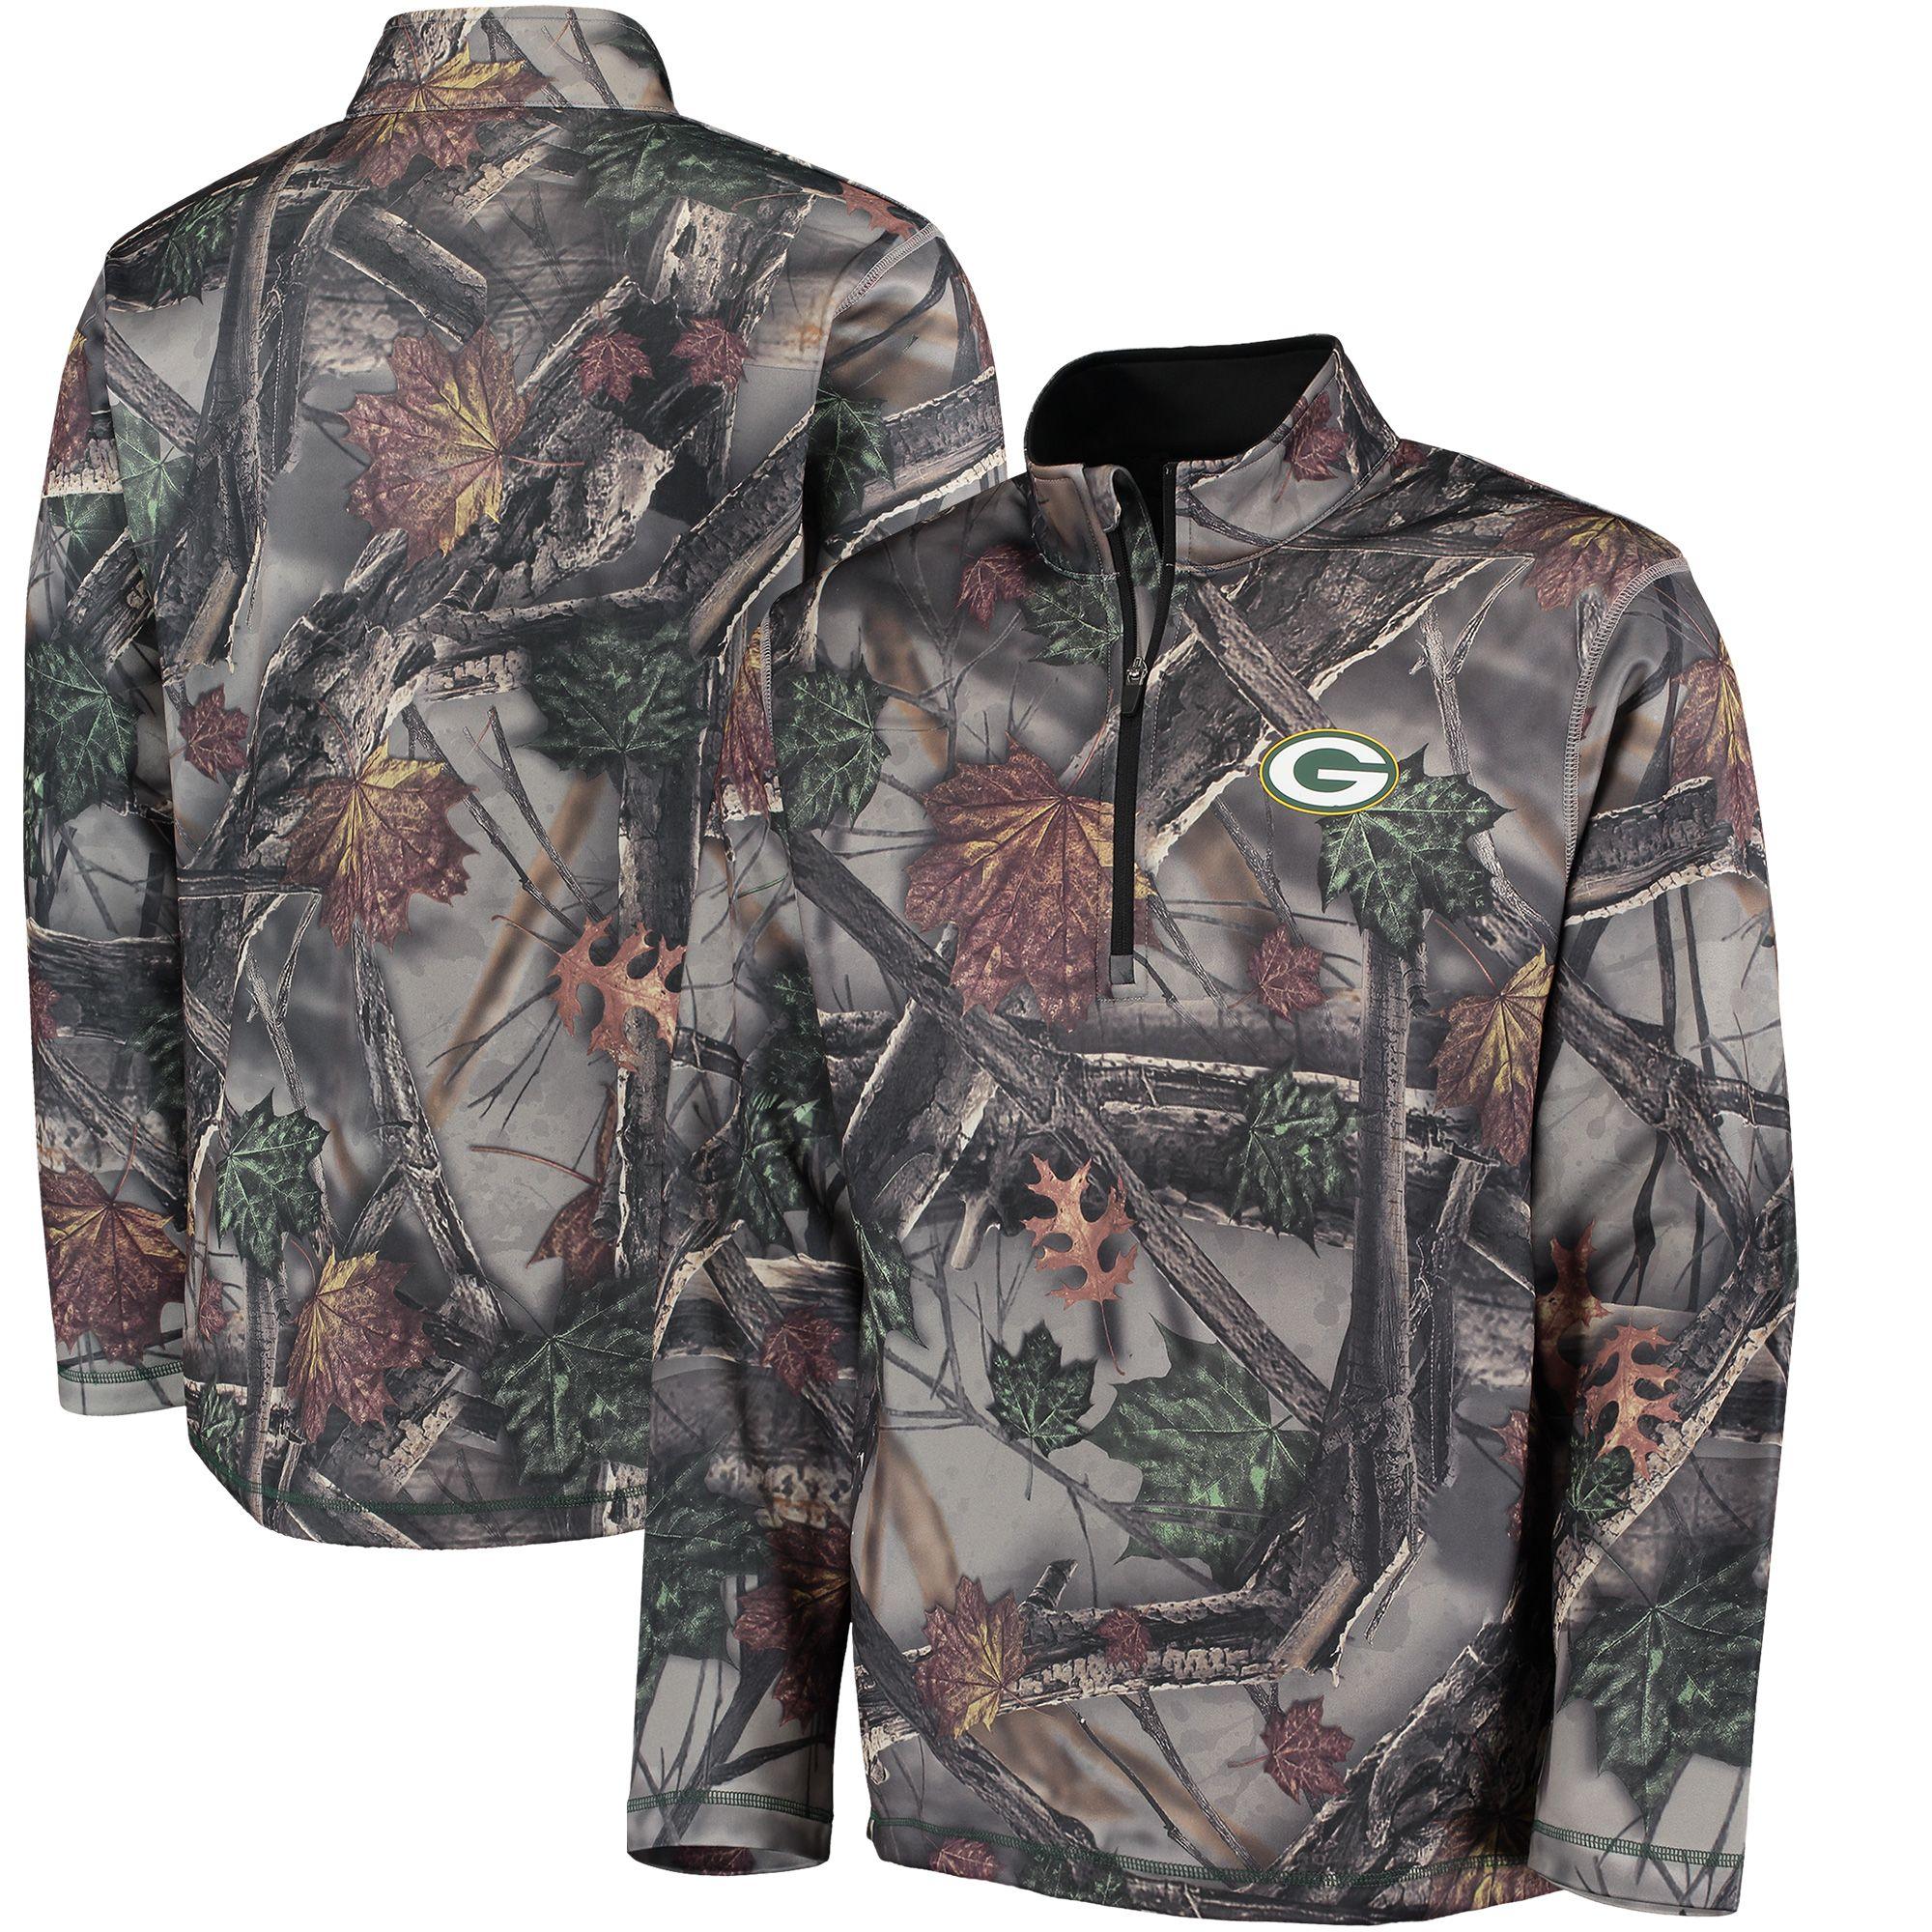 brand new 86df5 57cd3 NFL Green Bay Packers Majestic The Woods Half Zip Jacket ...